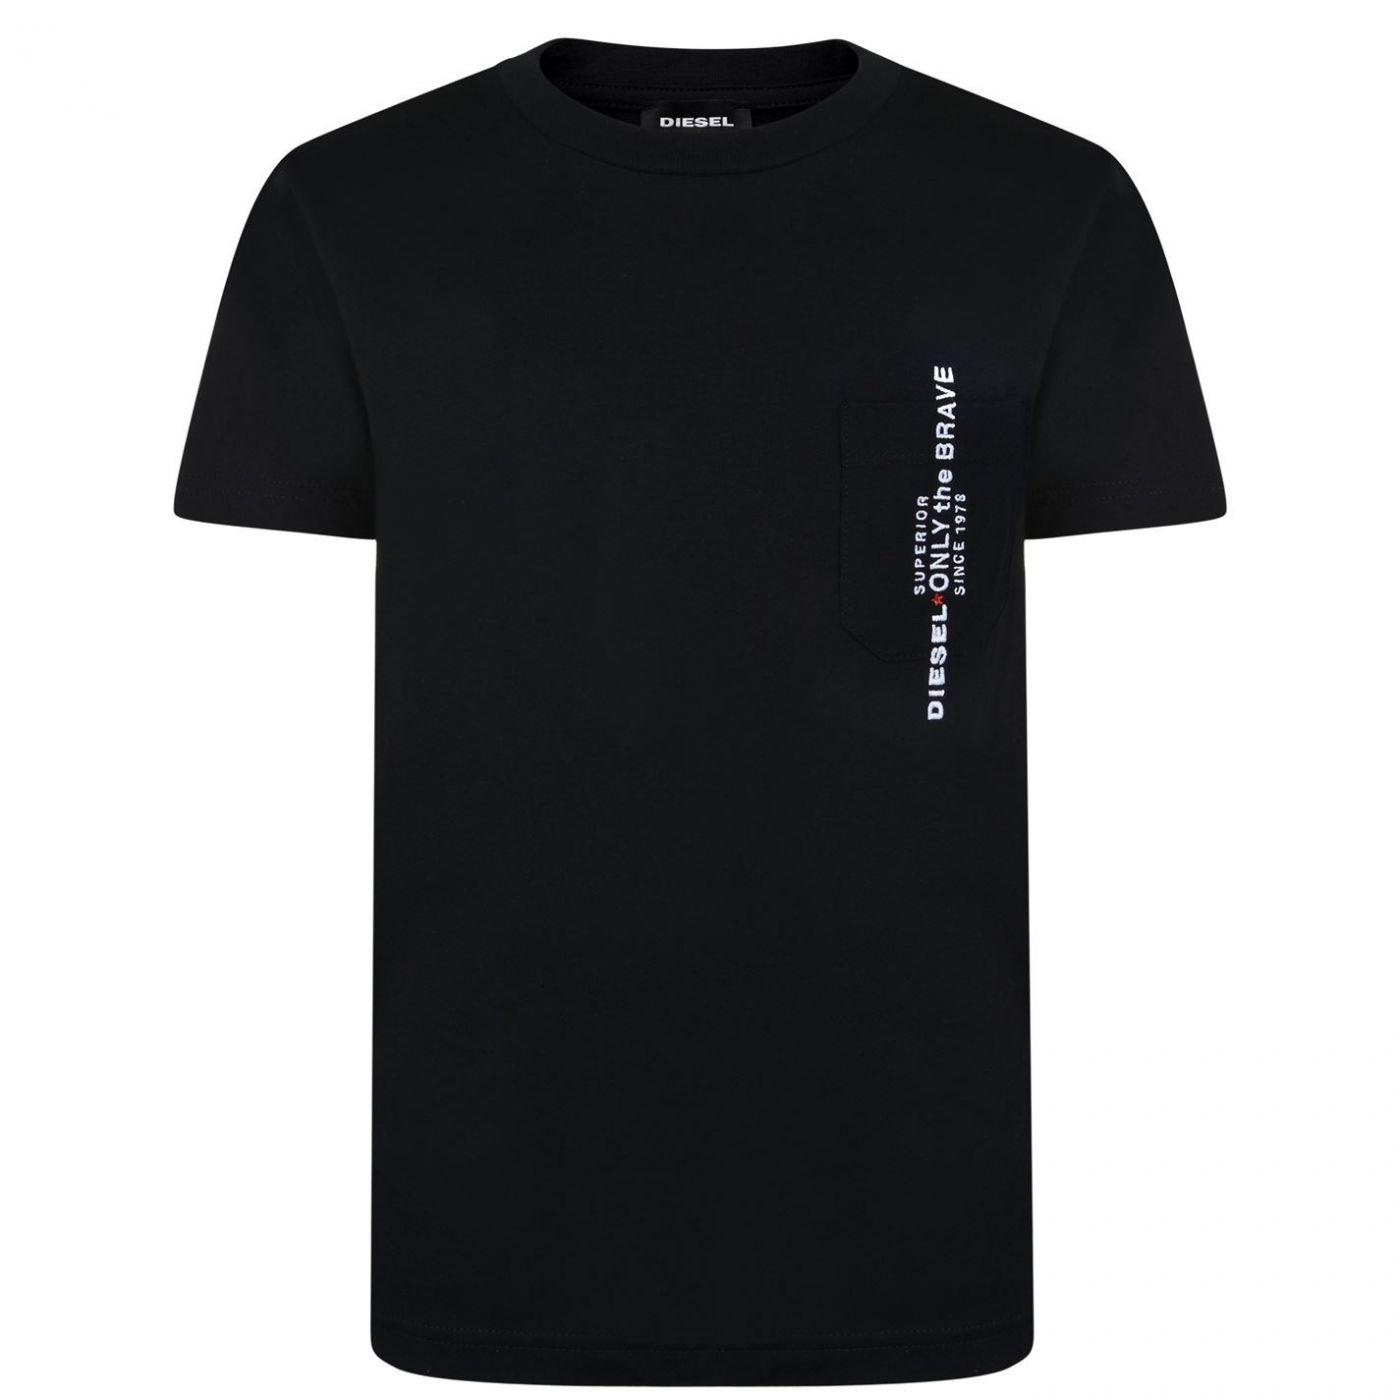 Diesel Pocket T Shirt